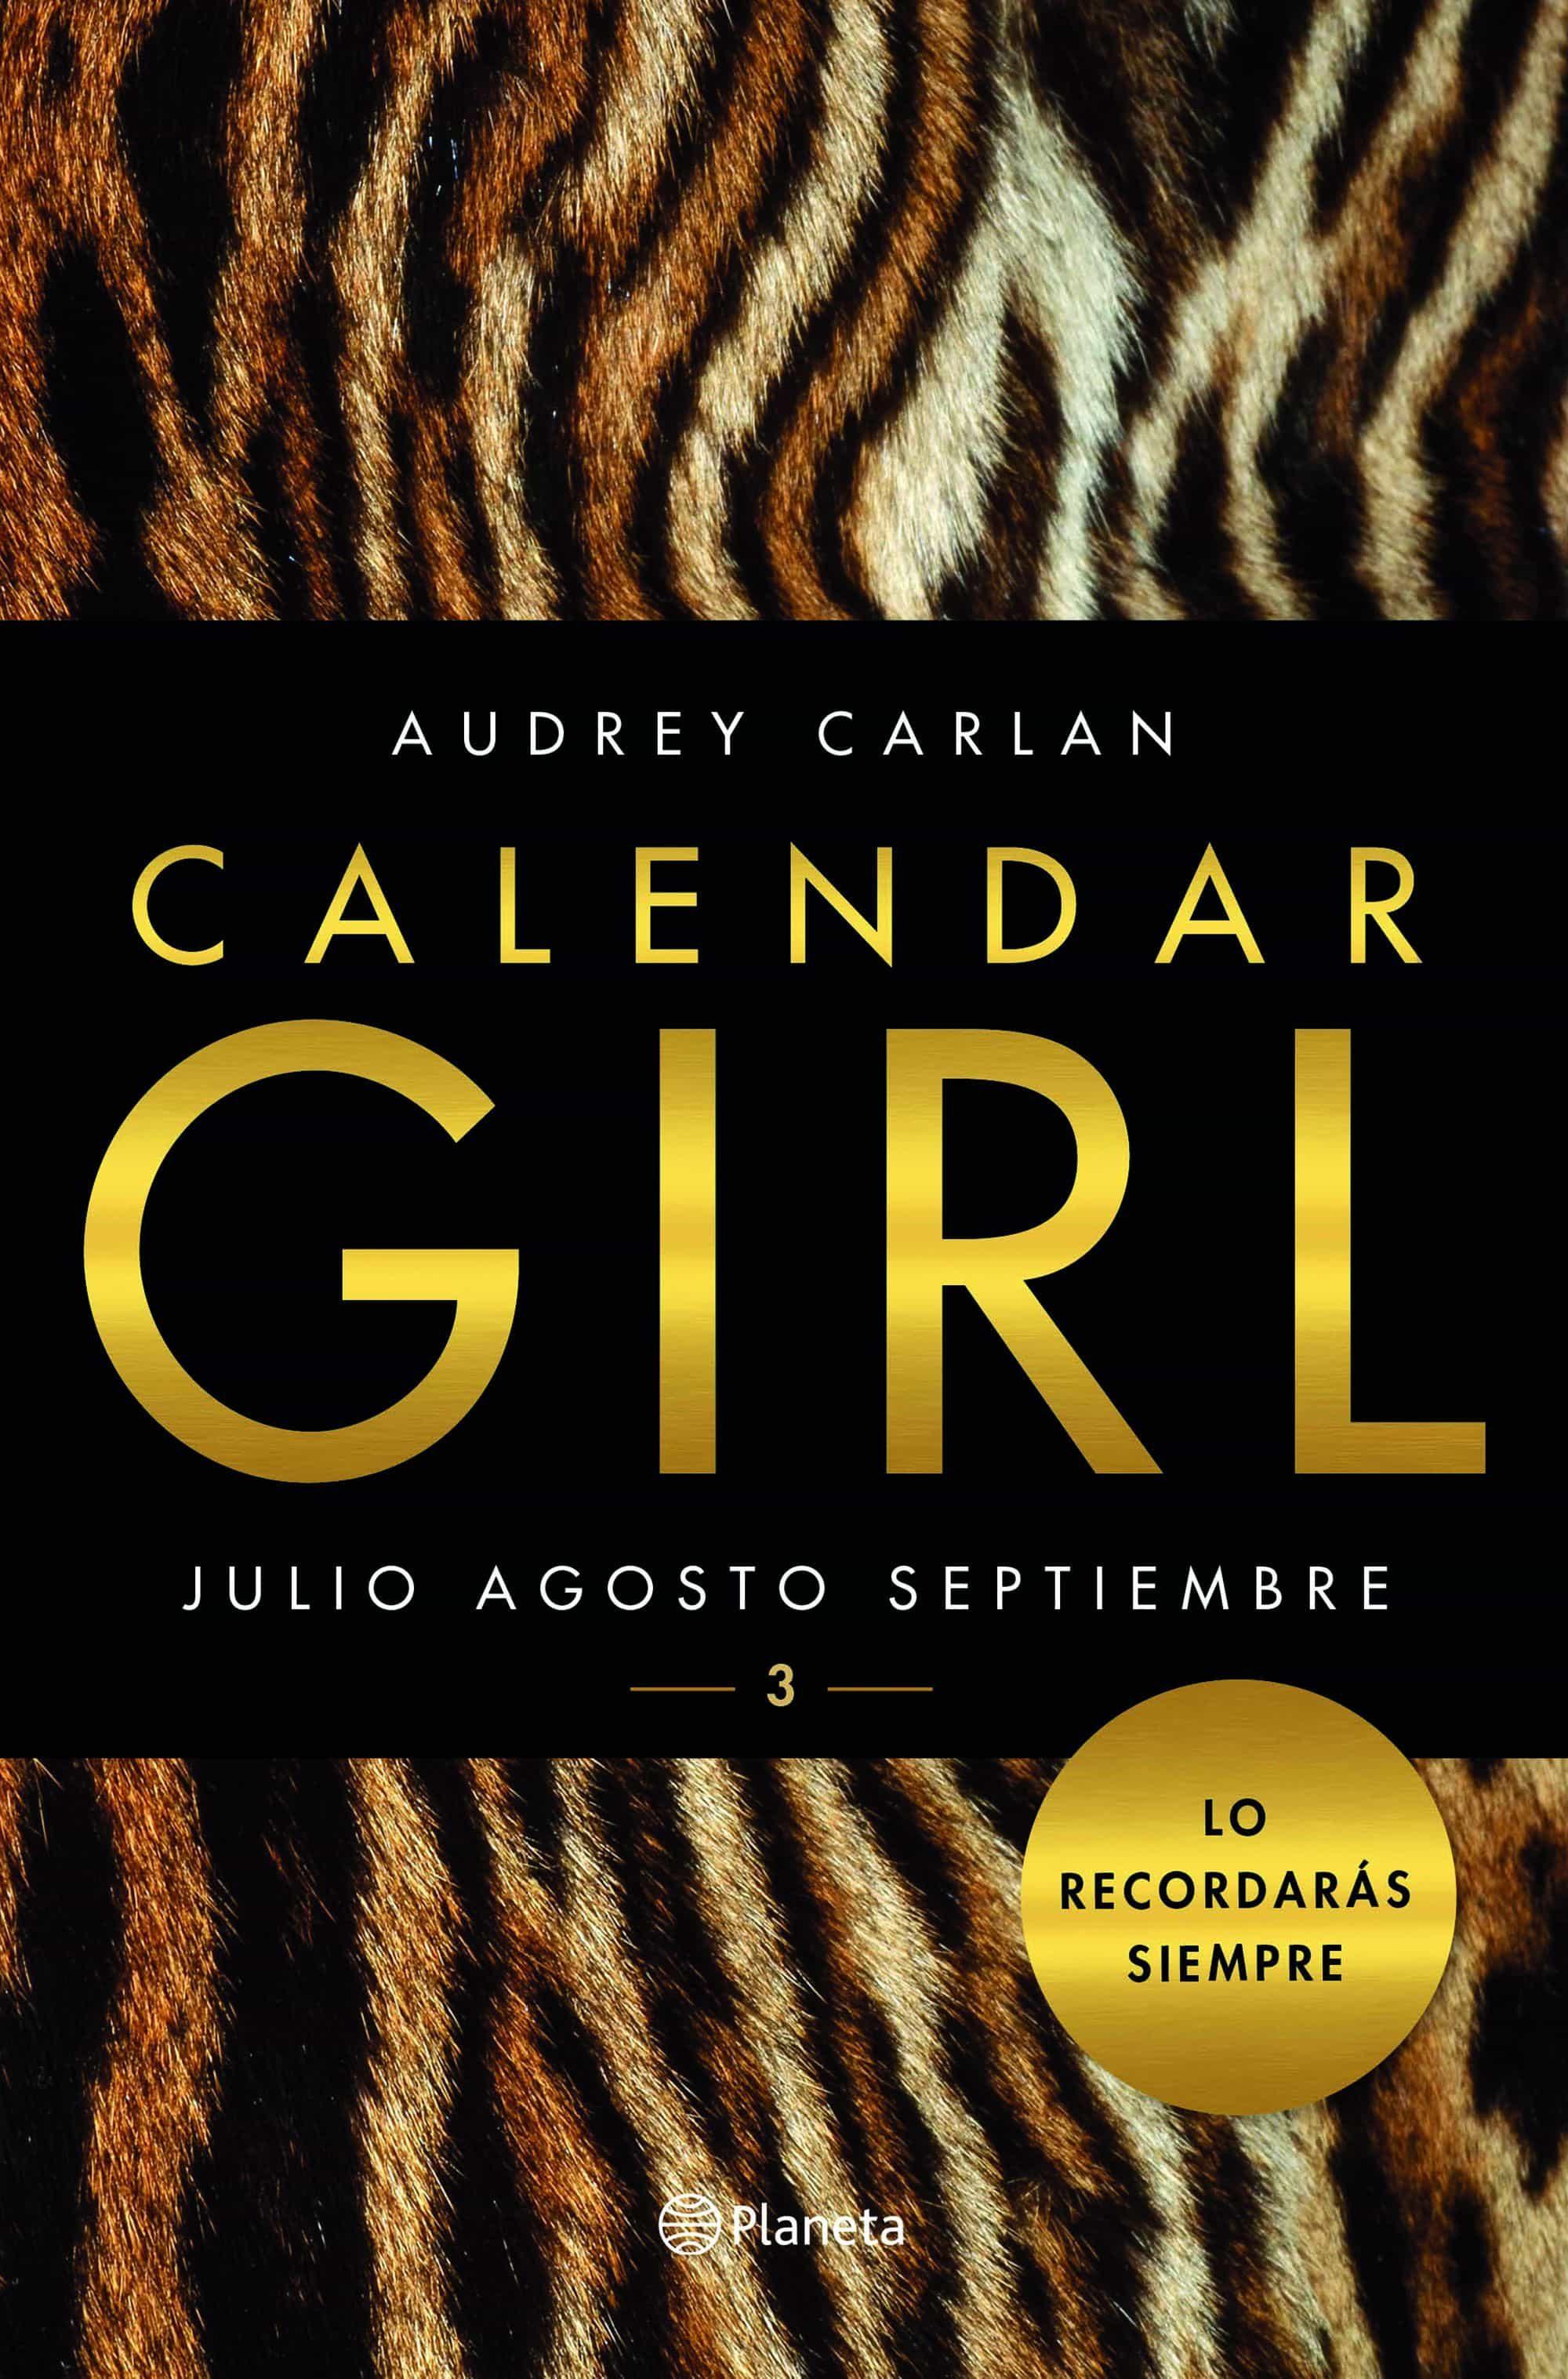 Resultado de imagen de calendar girl 3